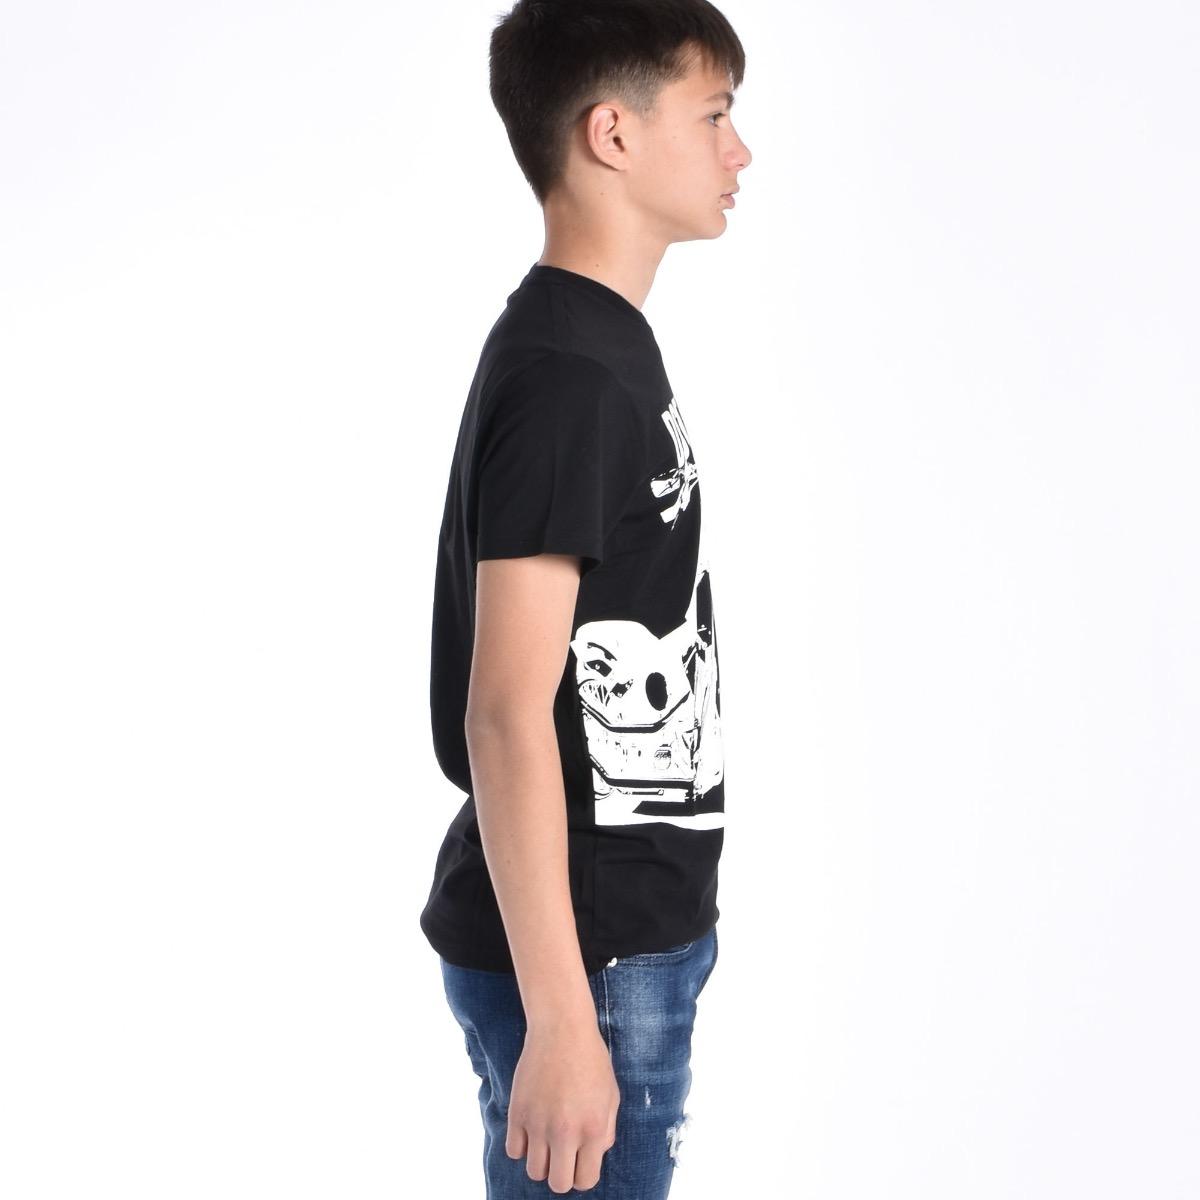 T-shirt stampa moto - Nera